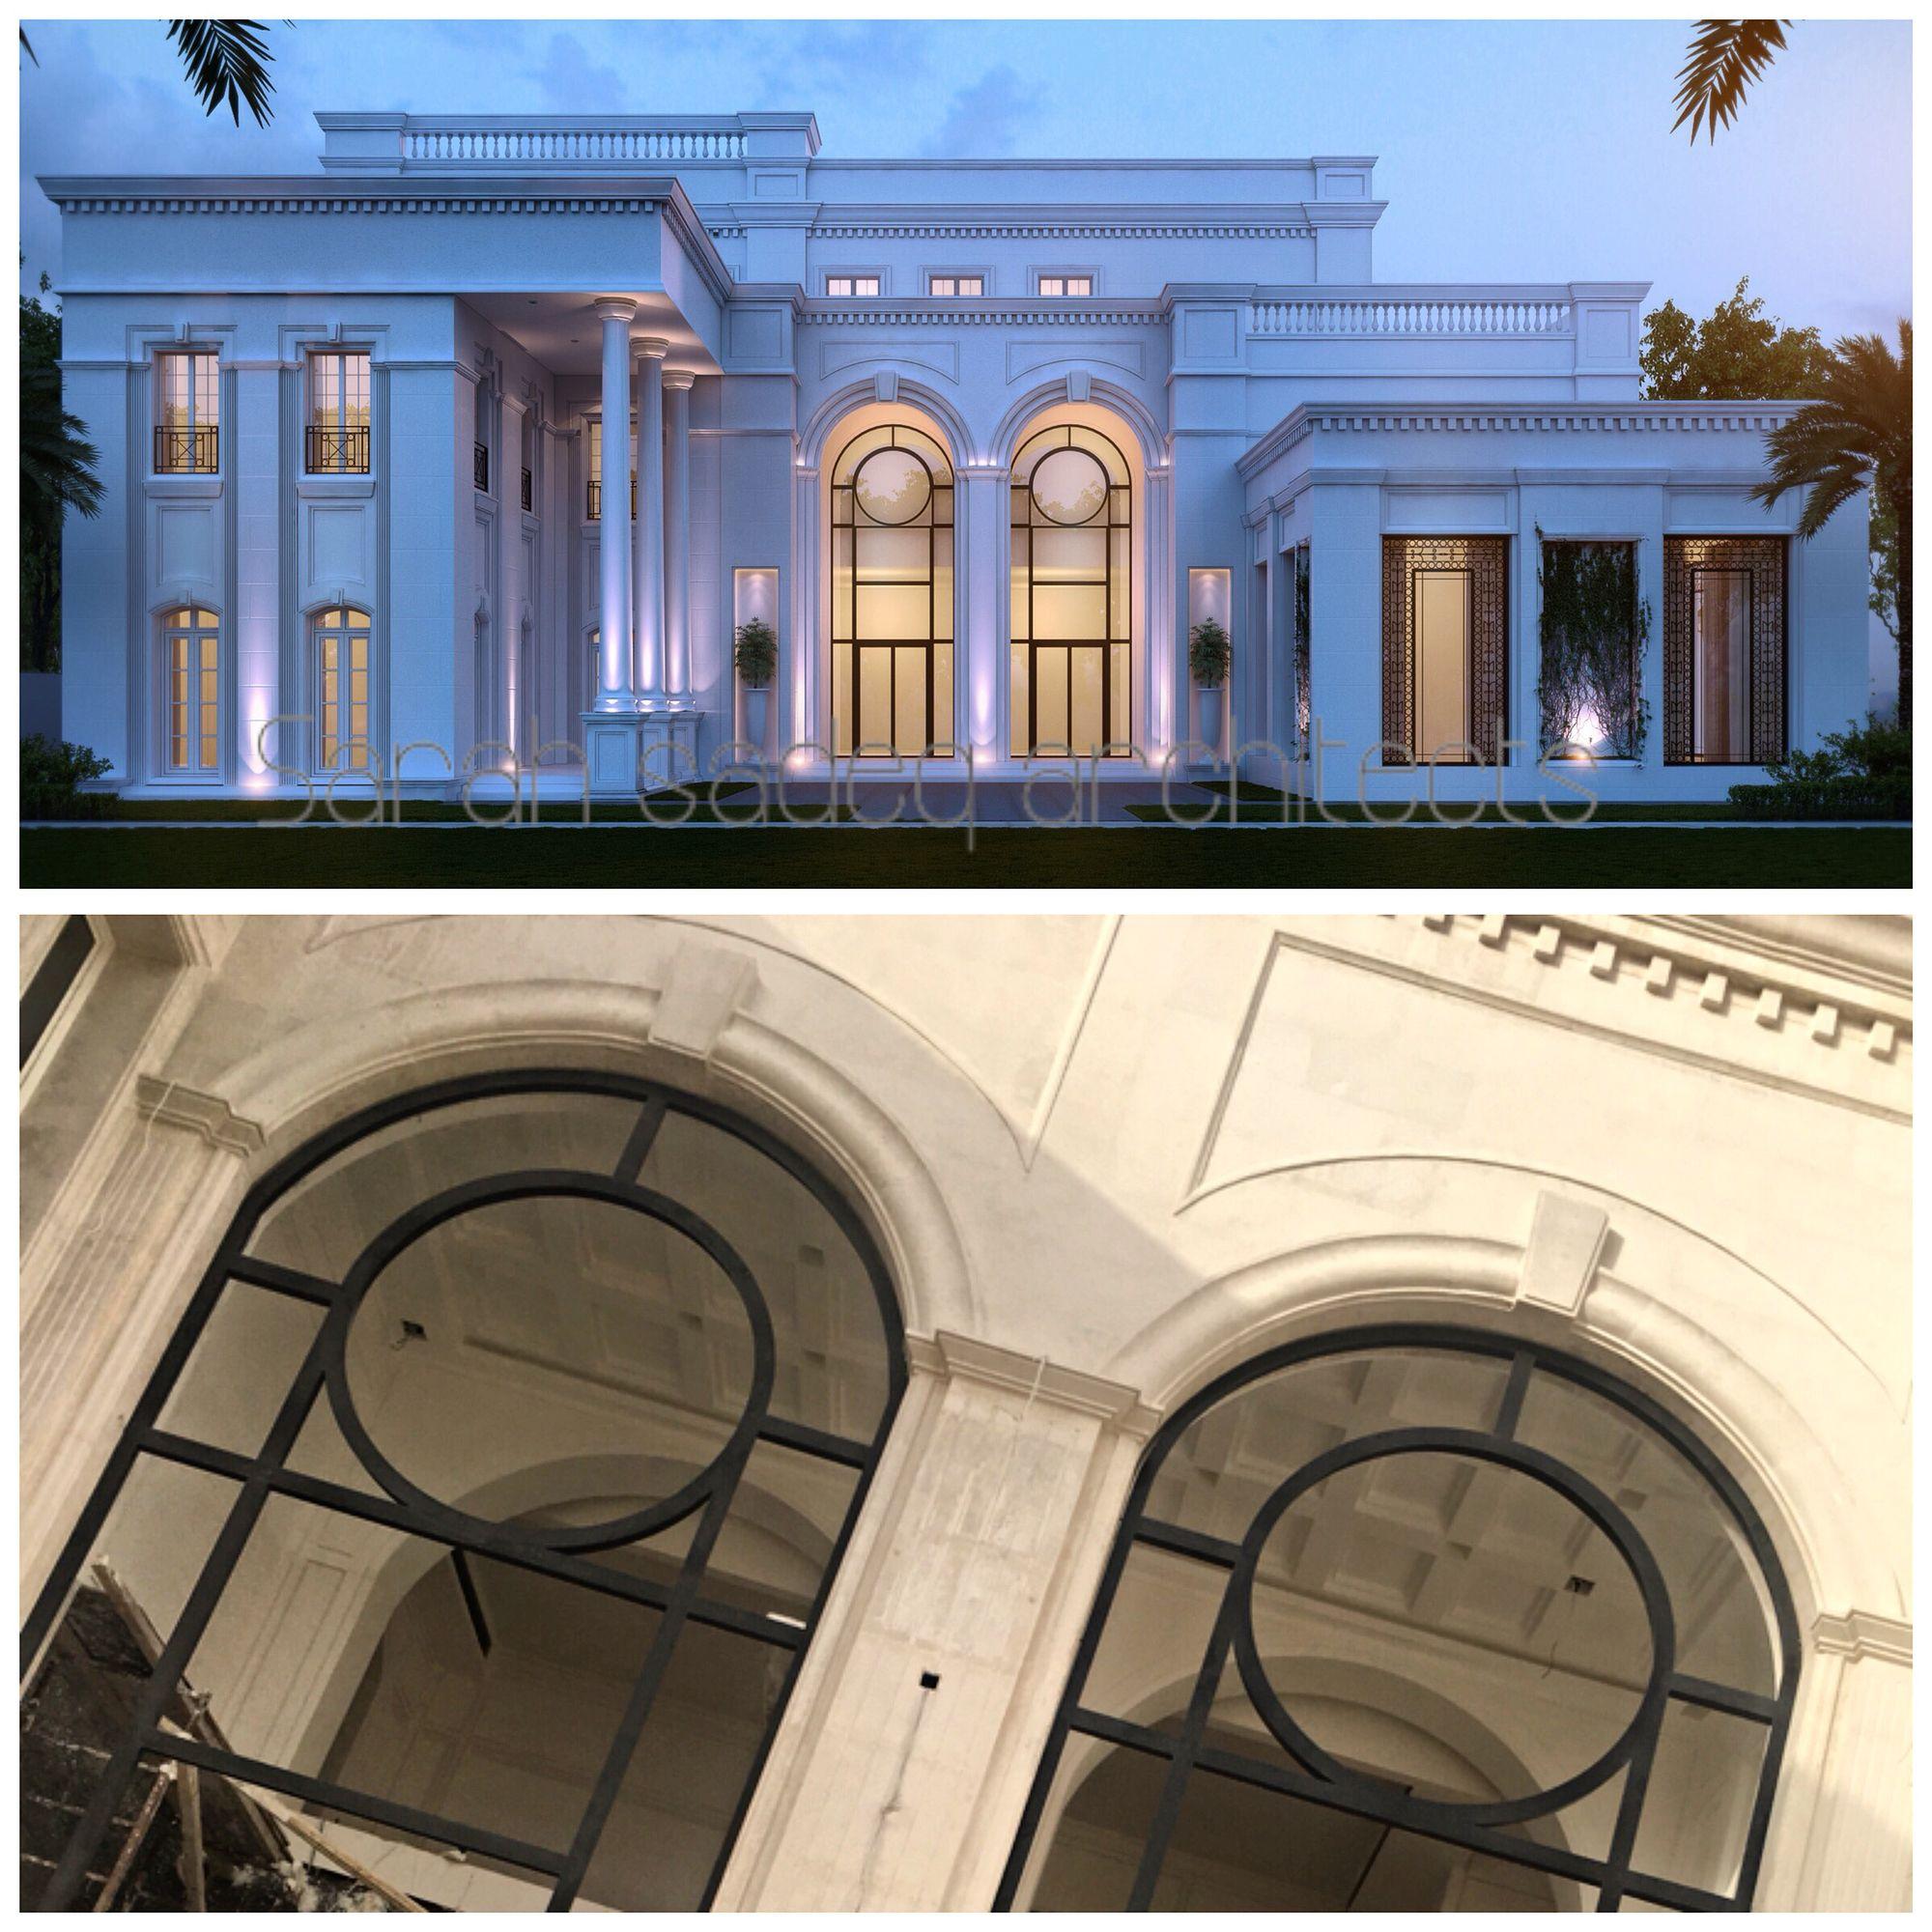 private villa ksa by sarah sadeq architects sarah sadeq architectes pinterest villas. Black Bedroom Furniture Sets. Home Design Ideas